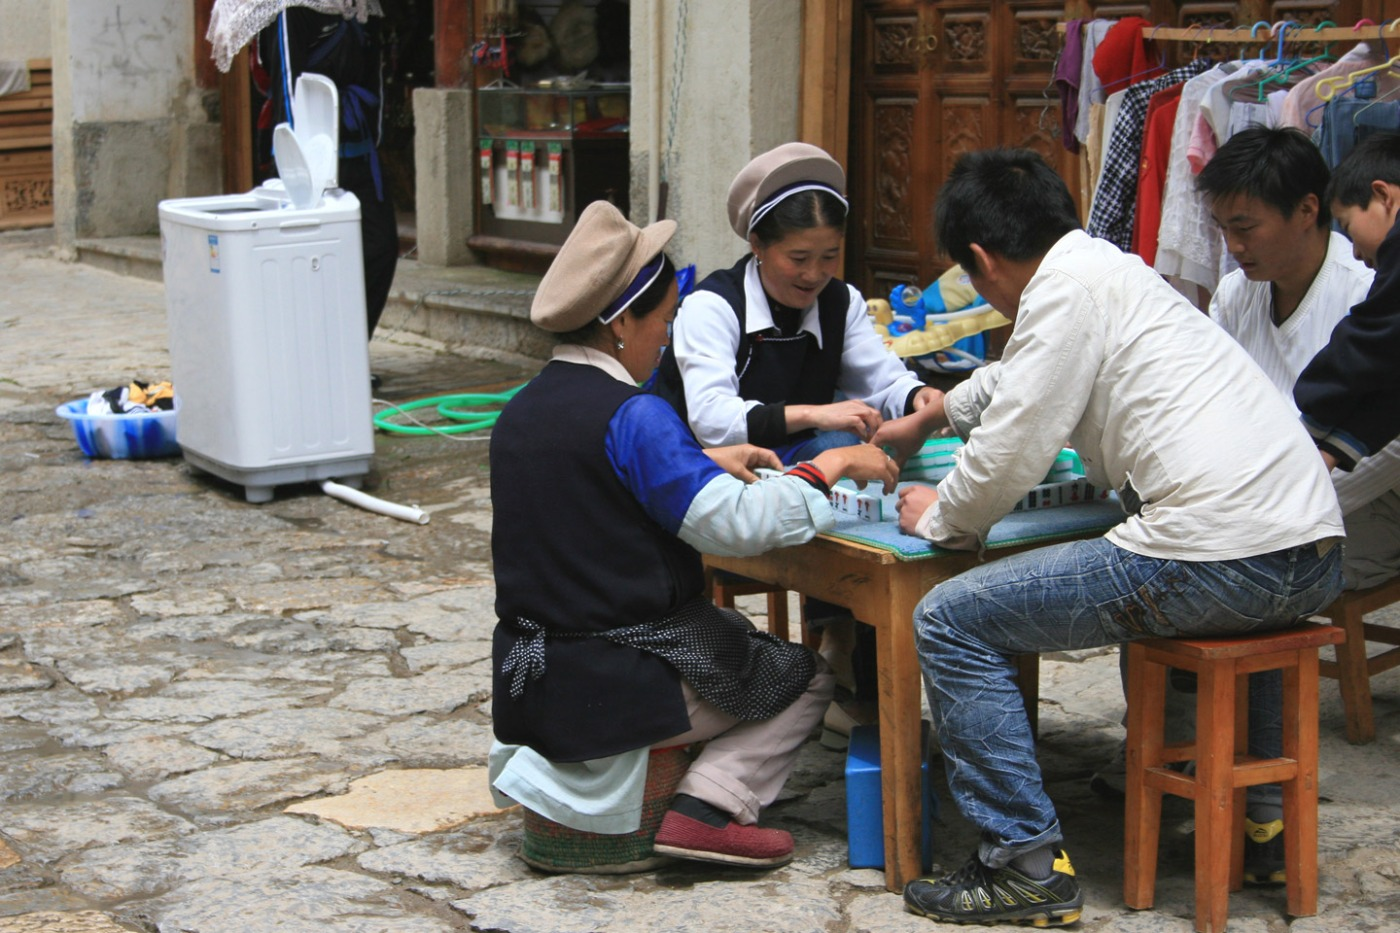 Shangri-la old town - street mahjong